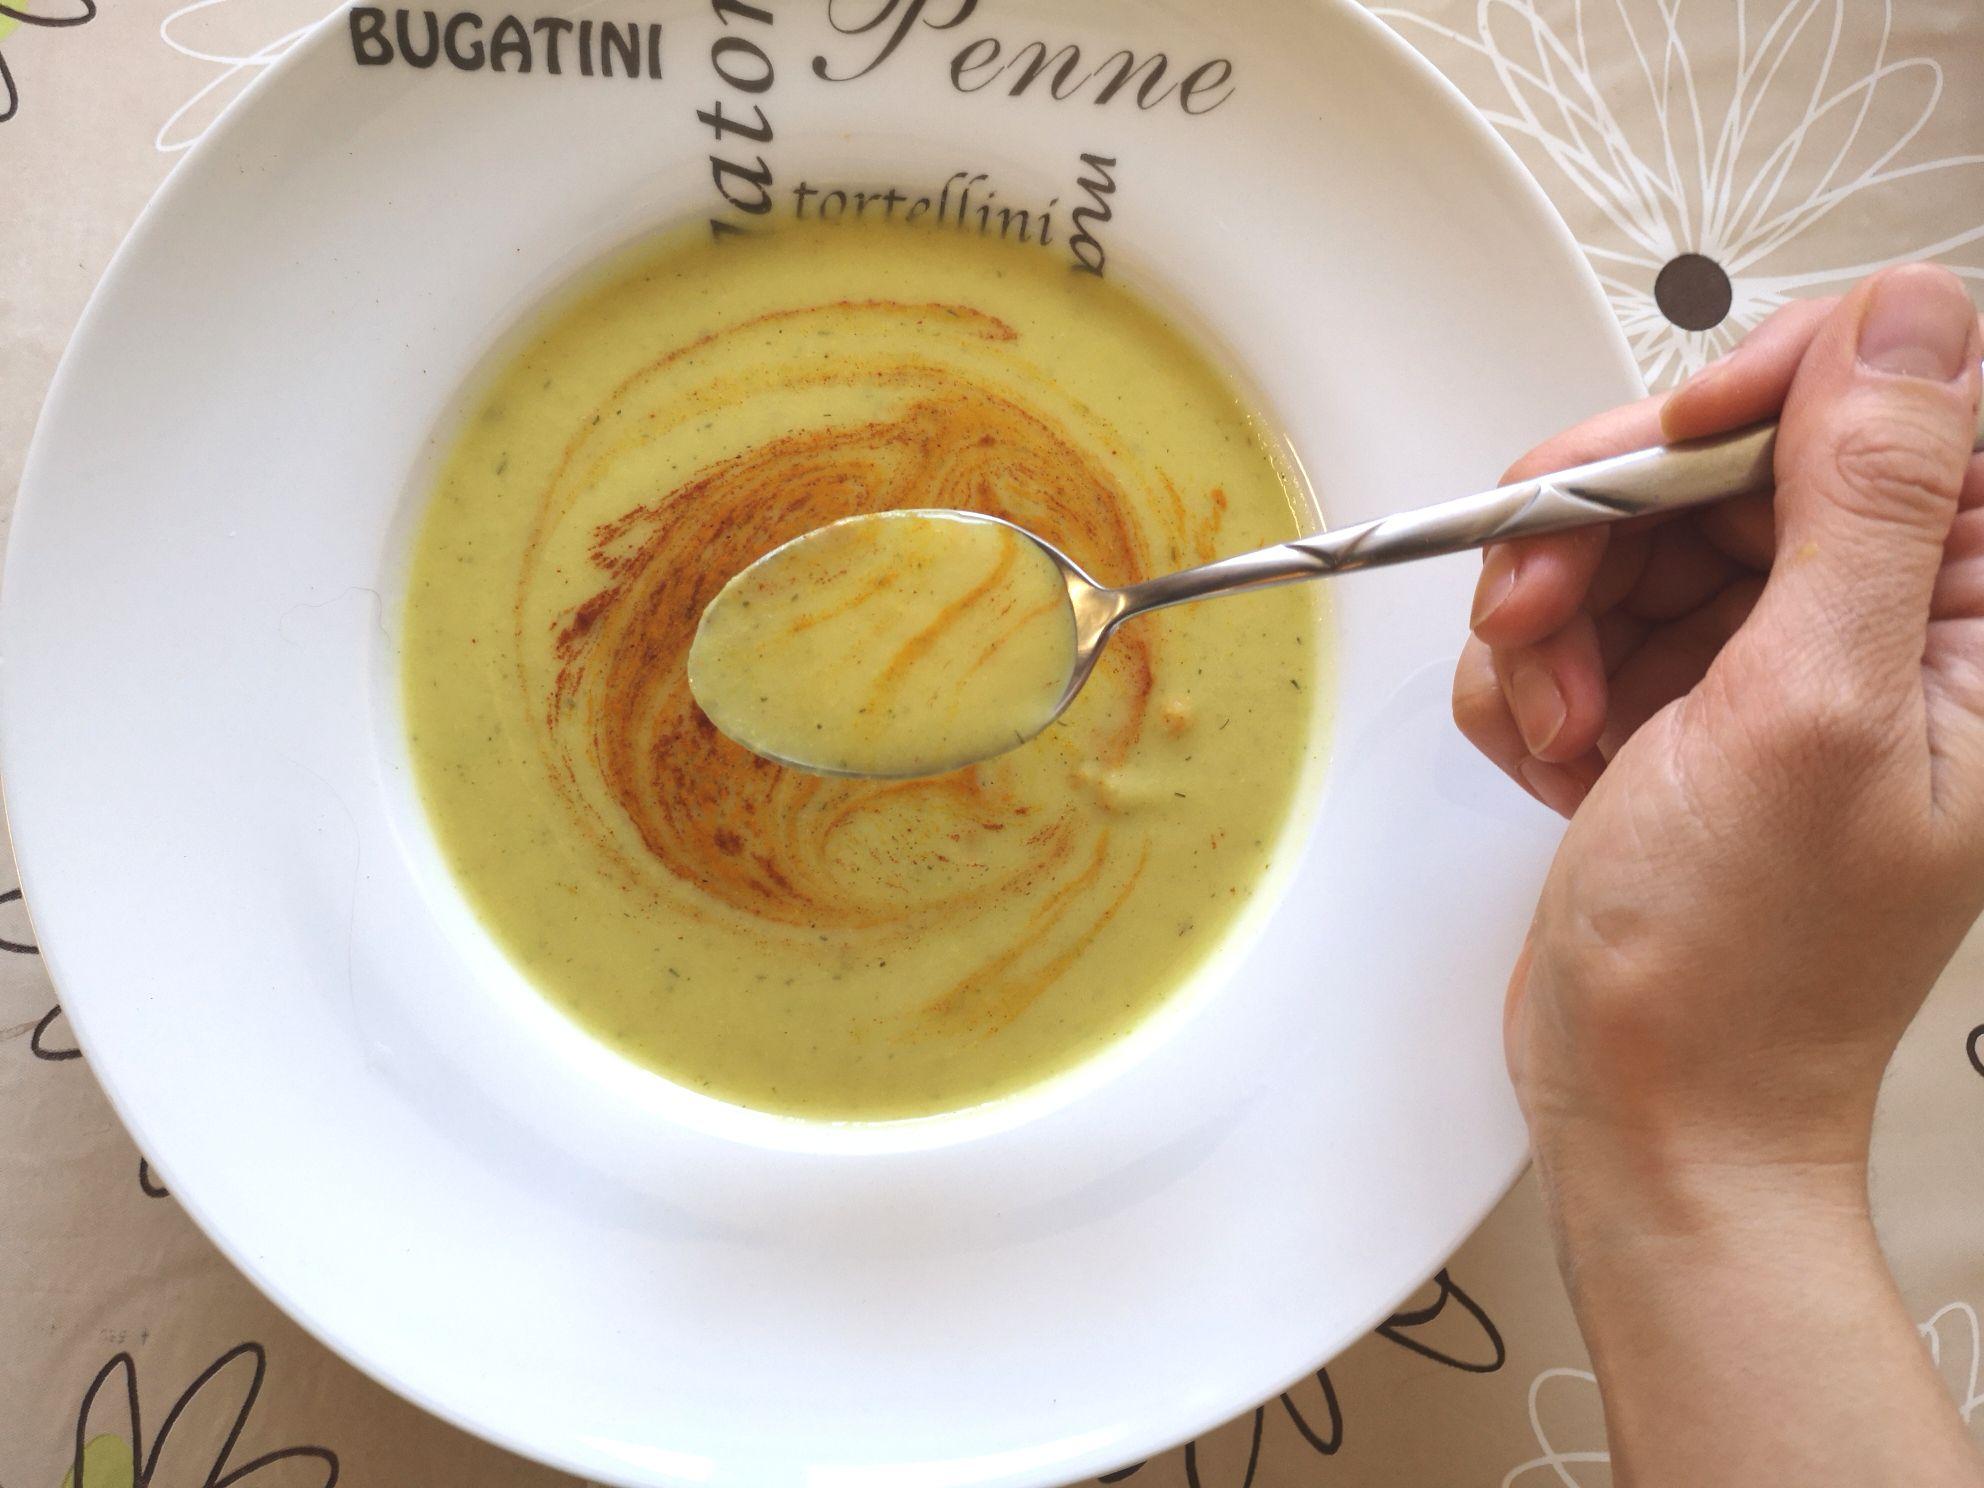 Cauliflower Broccoli Soup